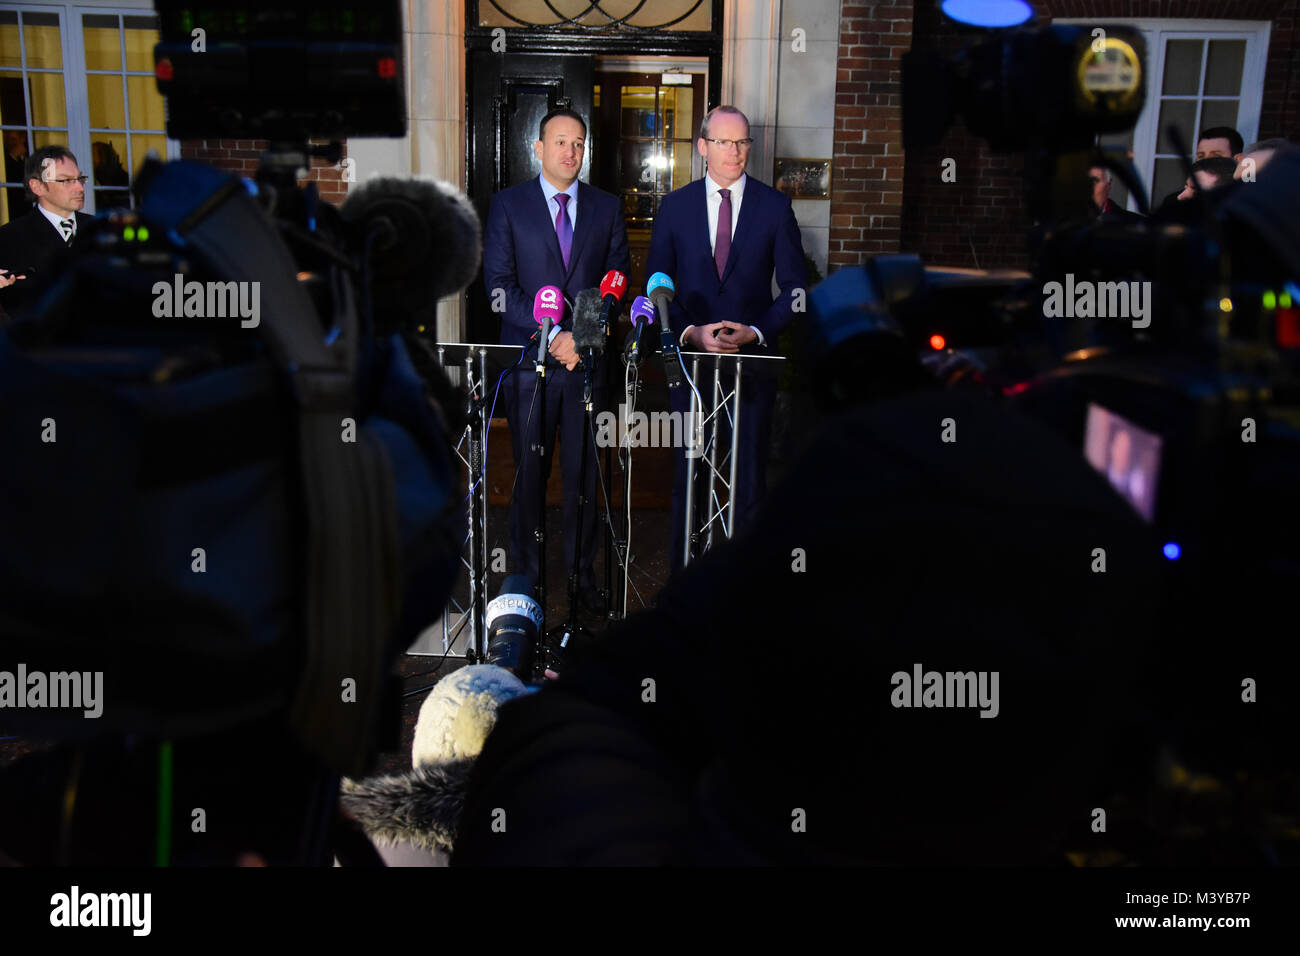 Belfast, UK. 12th Feb, 2018. Irelands Taoiseach Leo Varadkar and Tánaiste Simon Coveney address media at Stormont - Stock Image